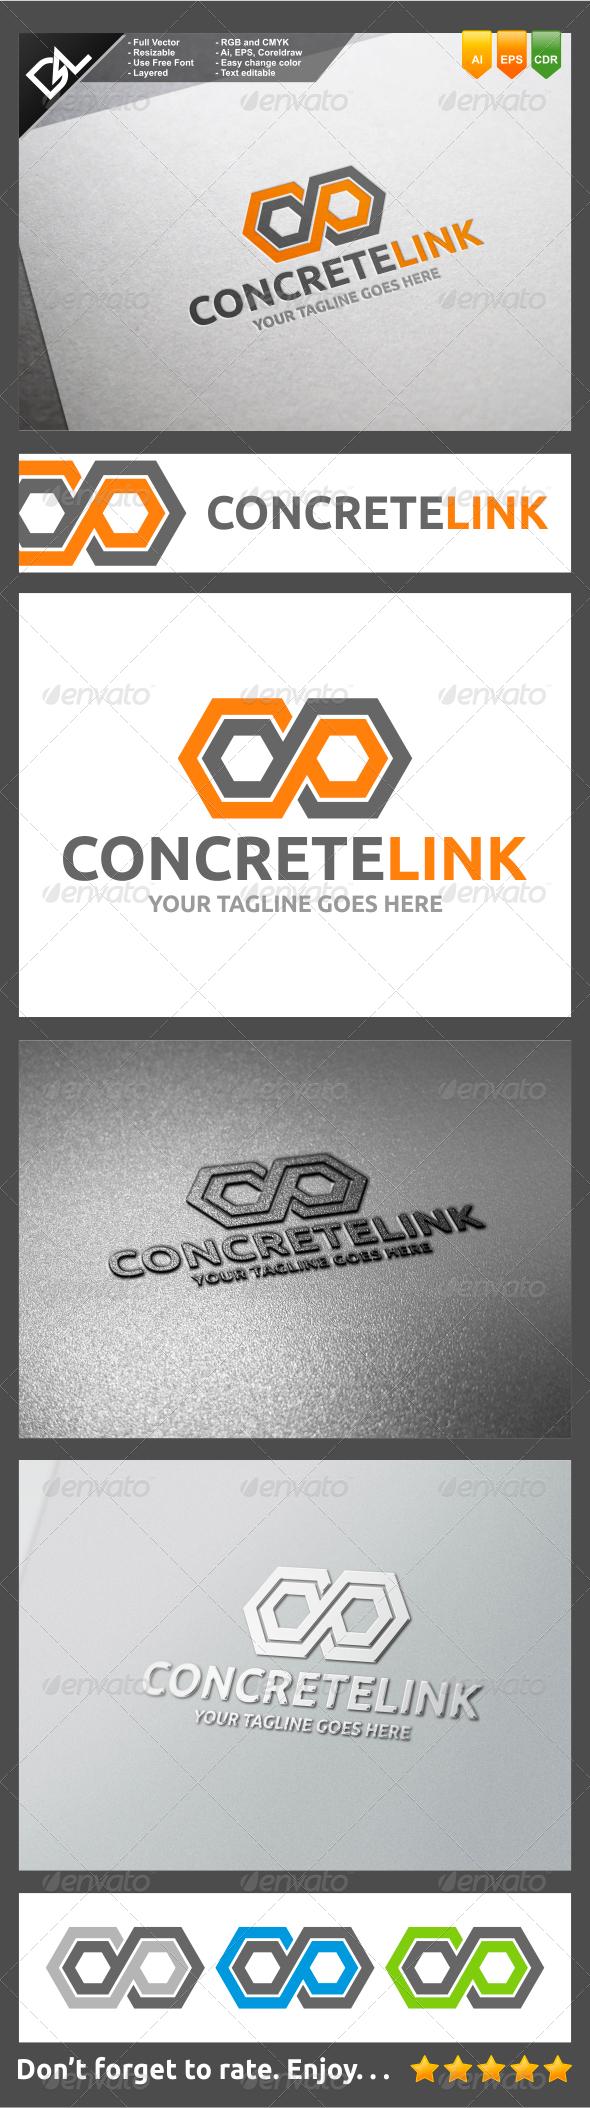 GraphicRiver Concrete Link 8257622